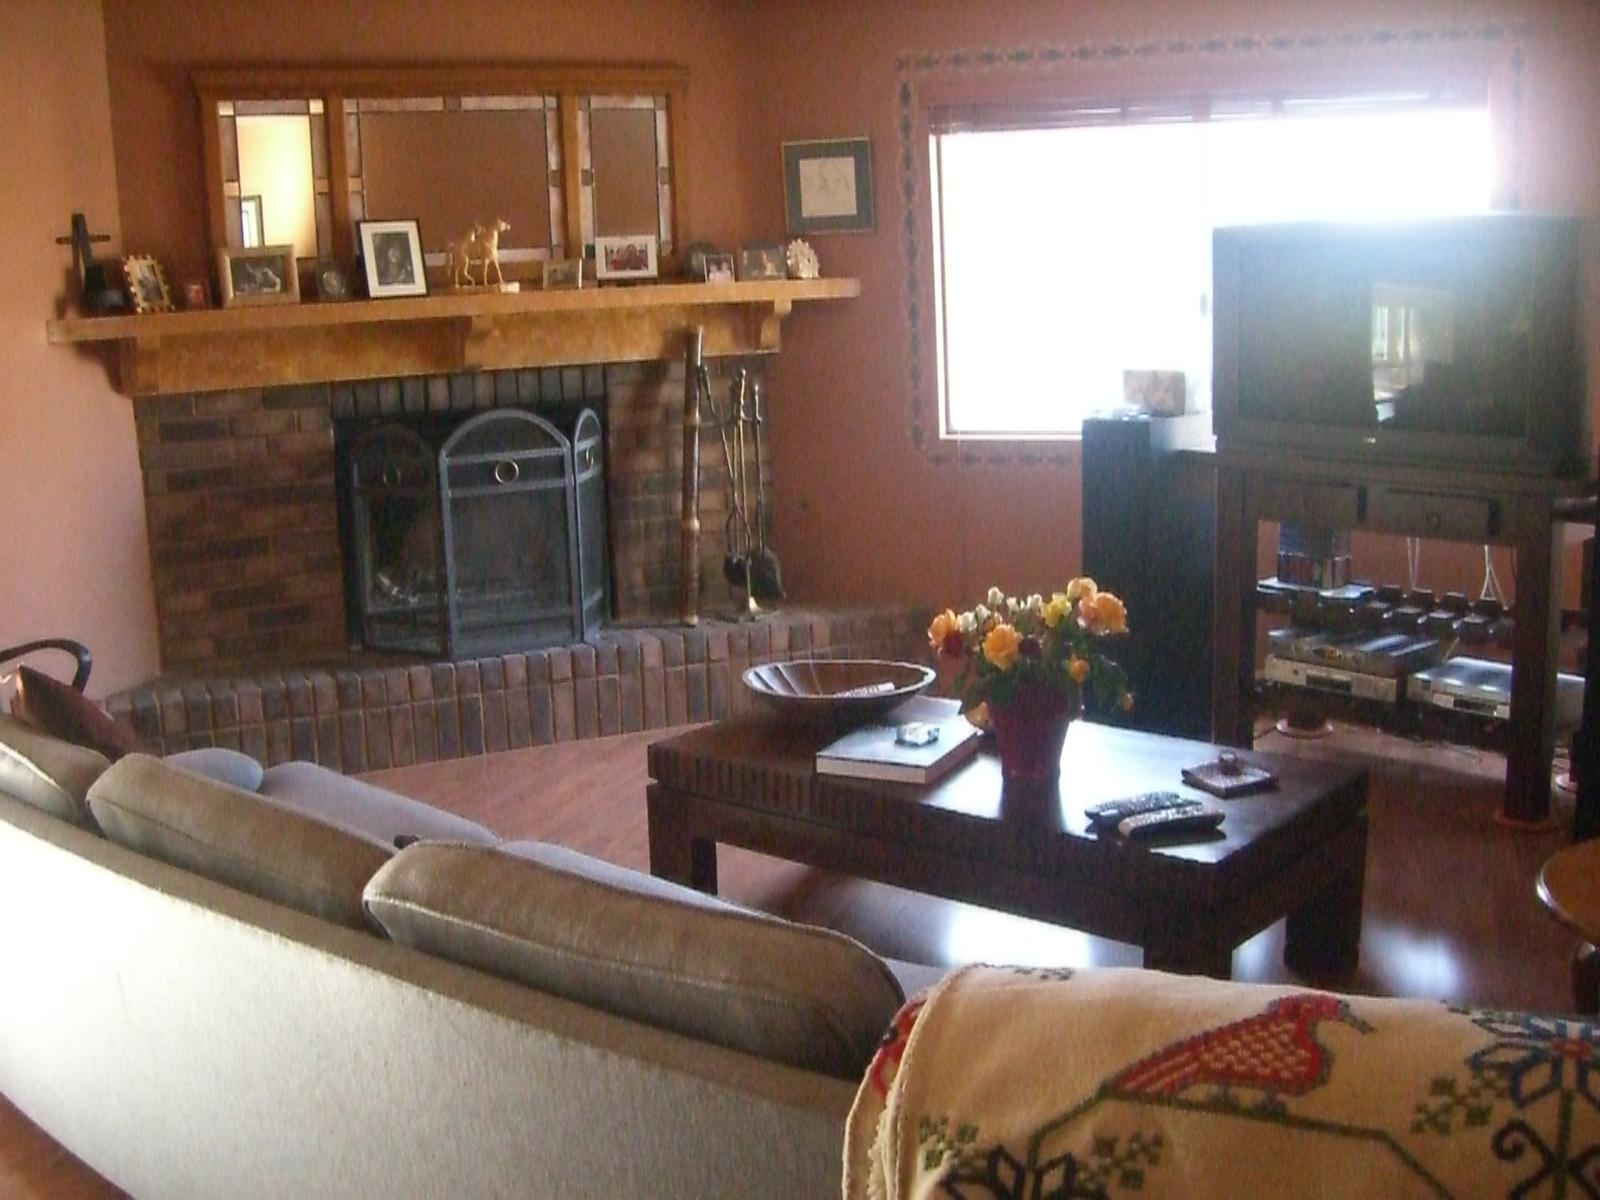 Family Room In Camarillo, California,